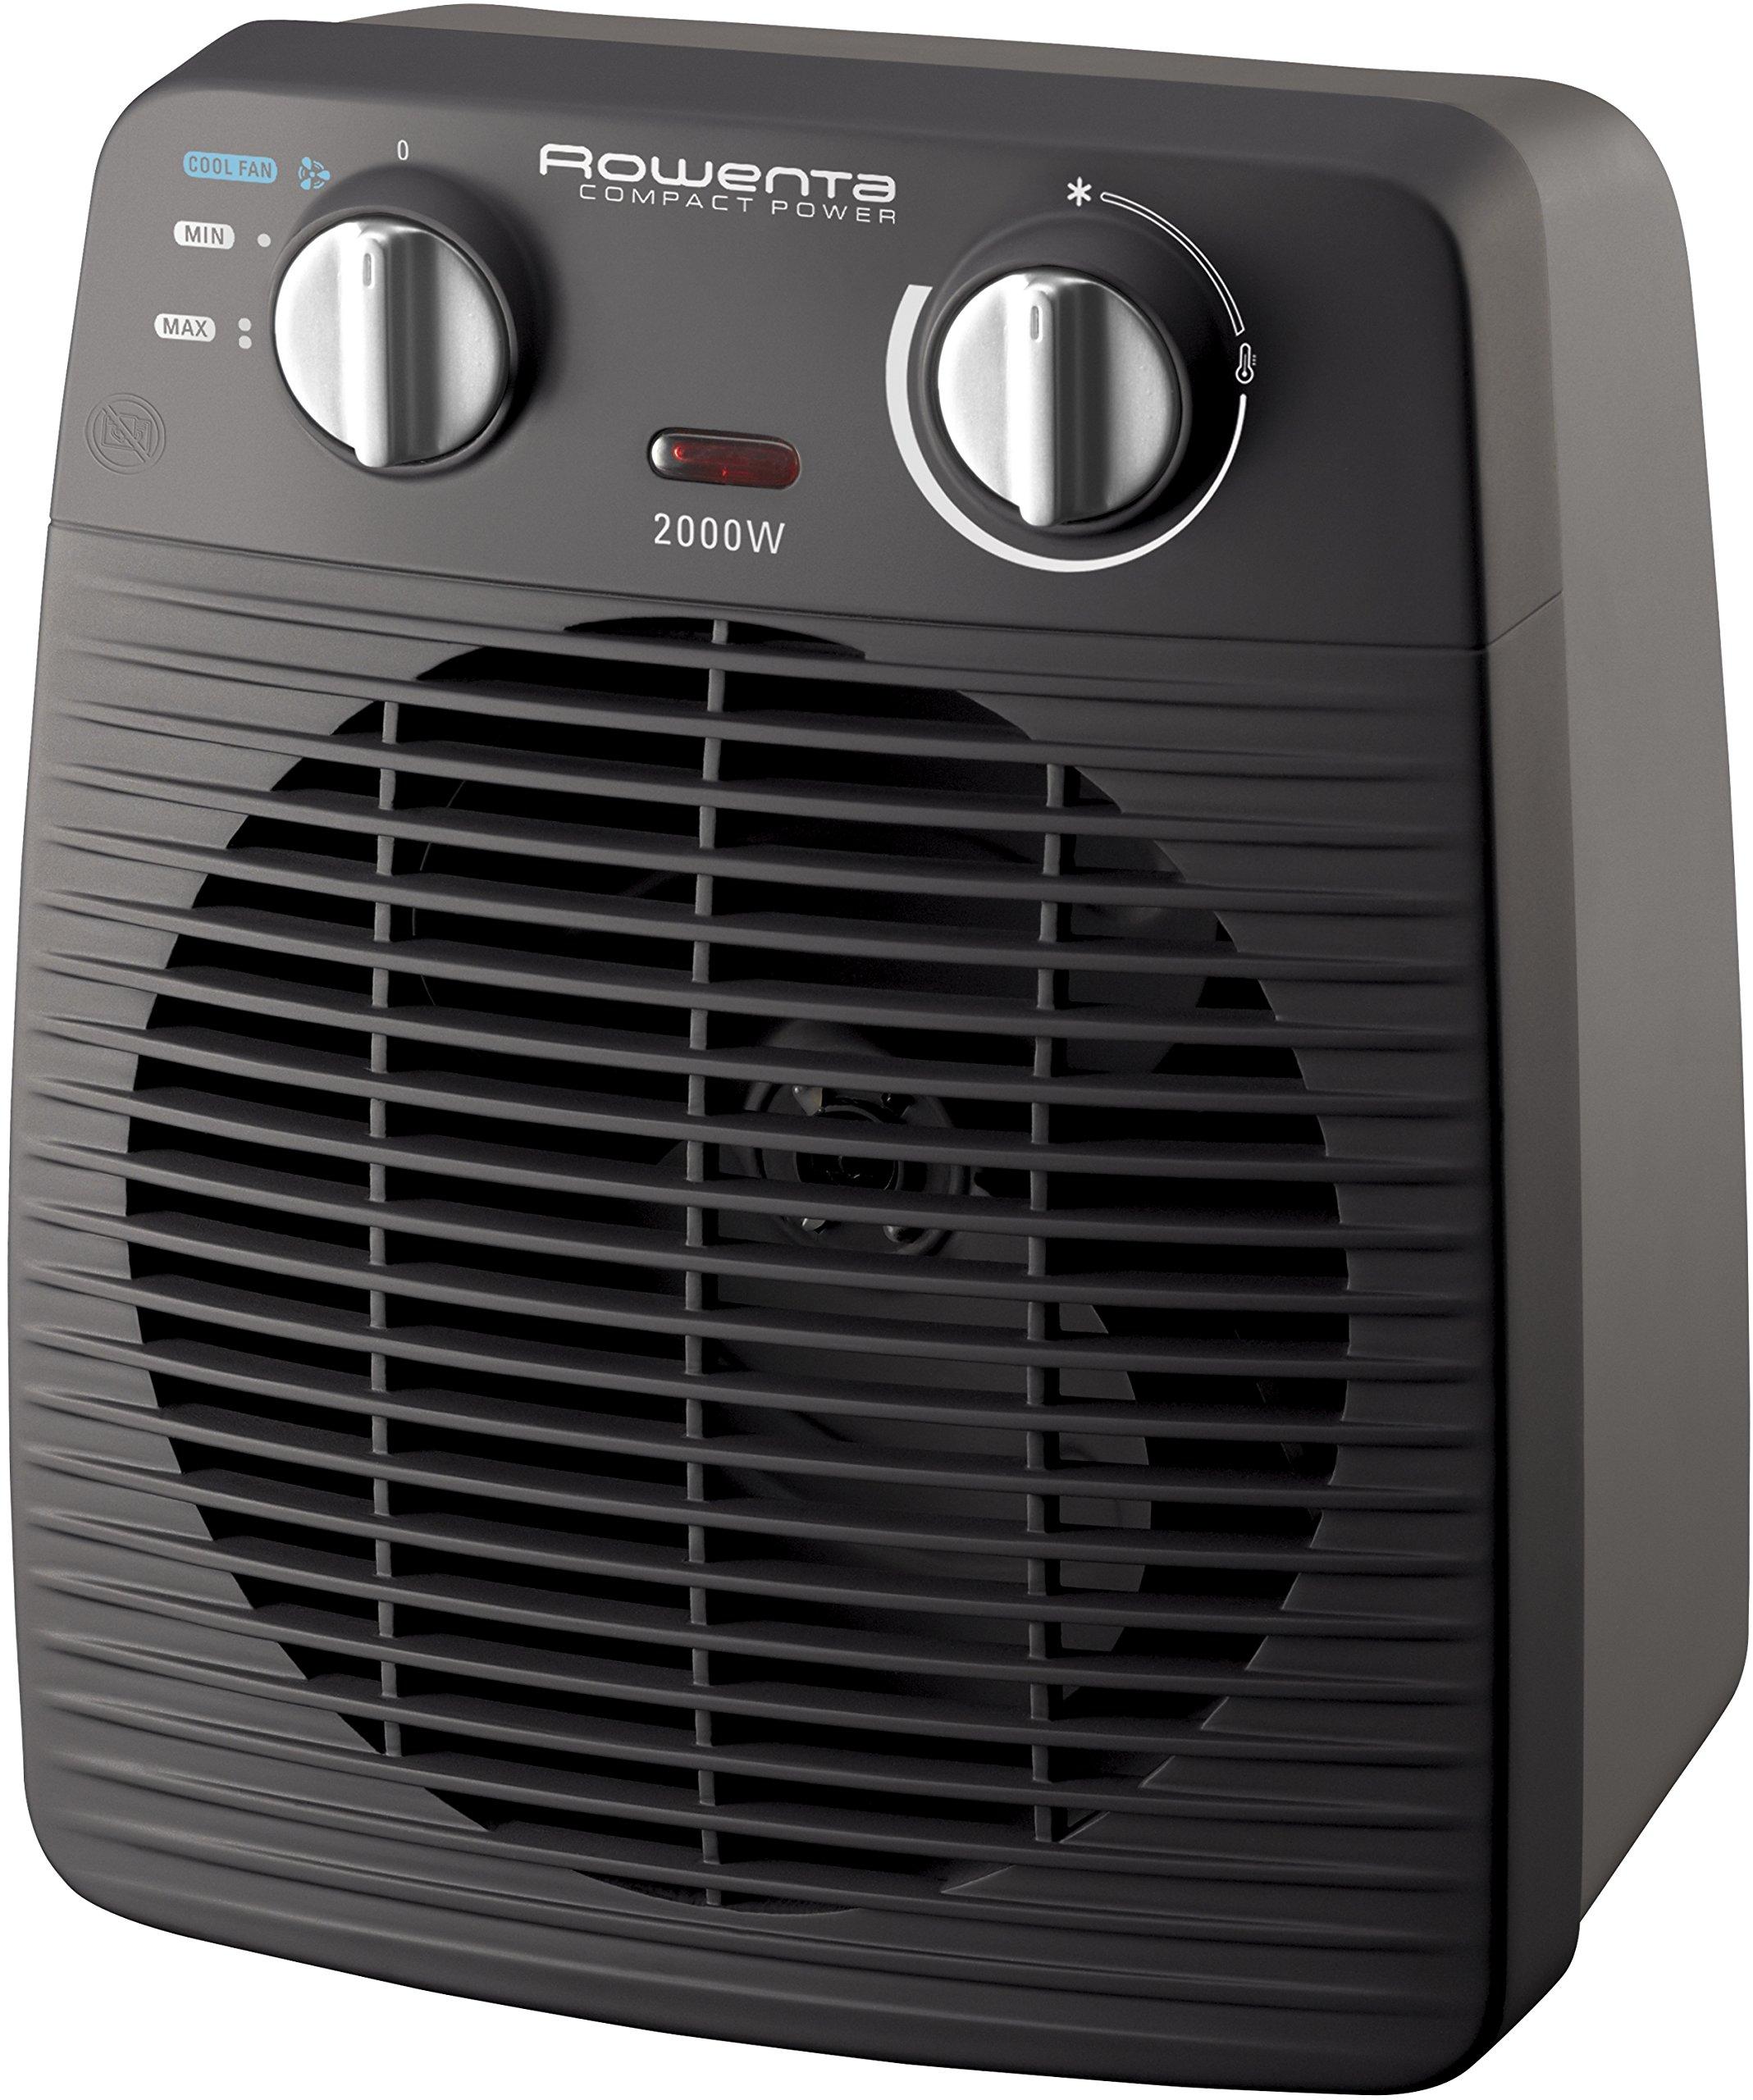 Rowenta Classic Indoor Black Fan - electric space heaters (Fan, 1.5 m, Indoor, Black, 25 m², 2000 W